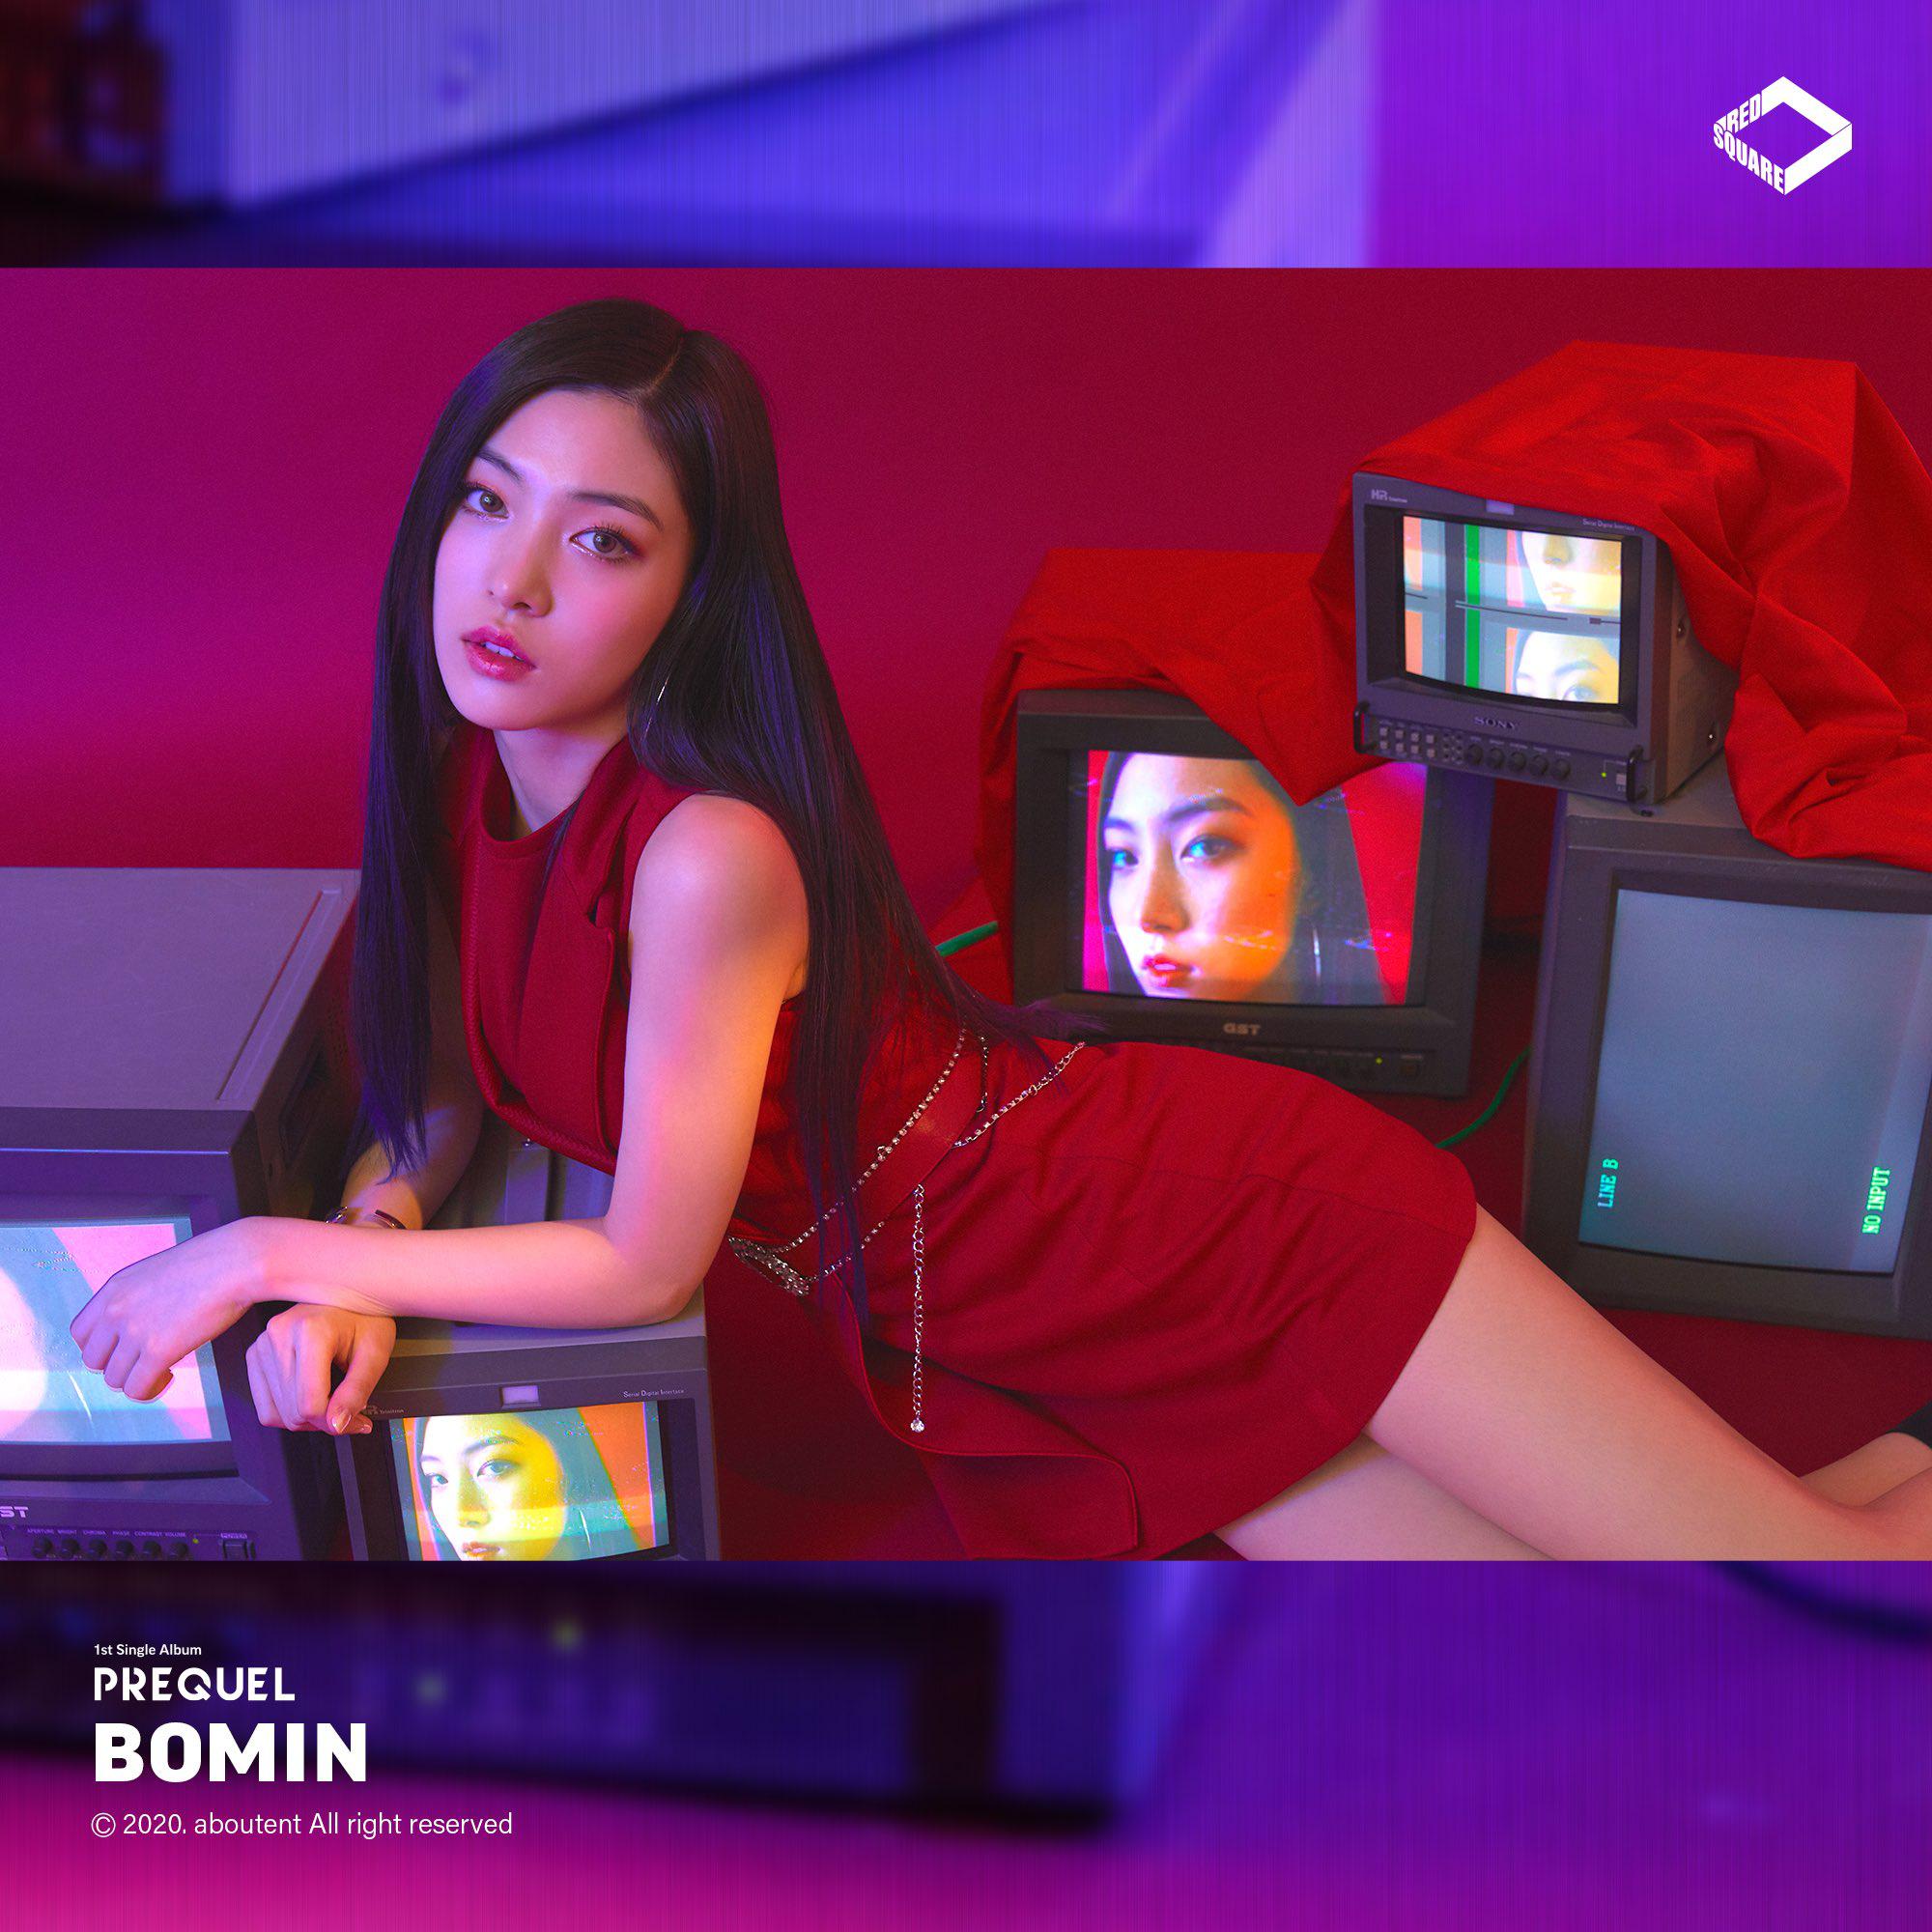 Bomin (REDSQUARE)